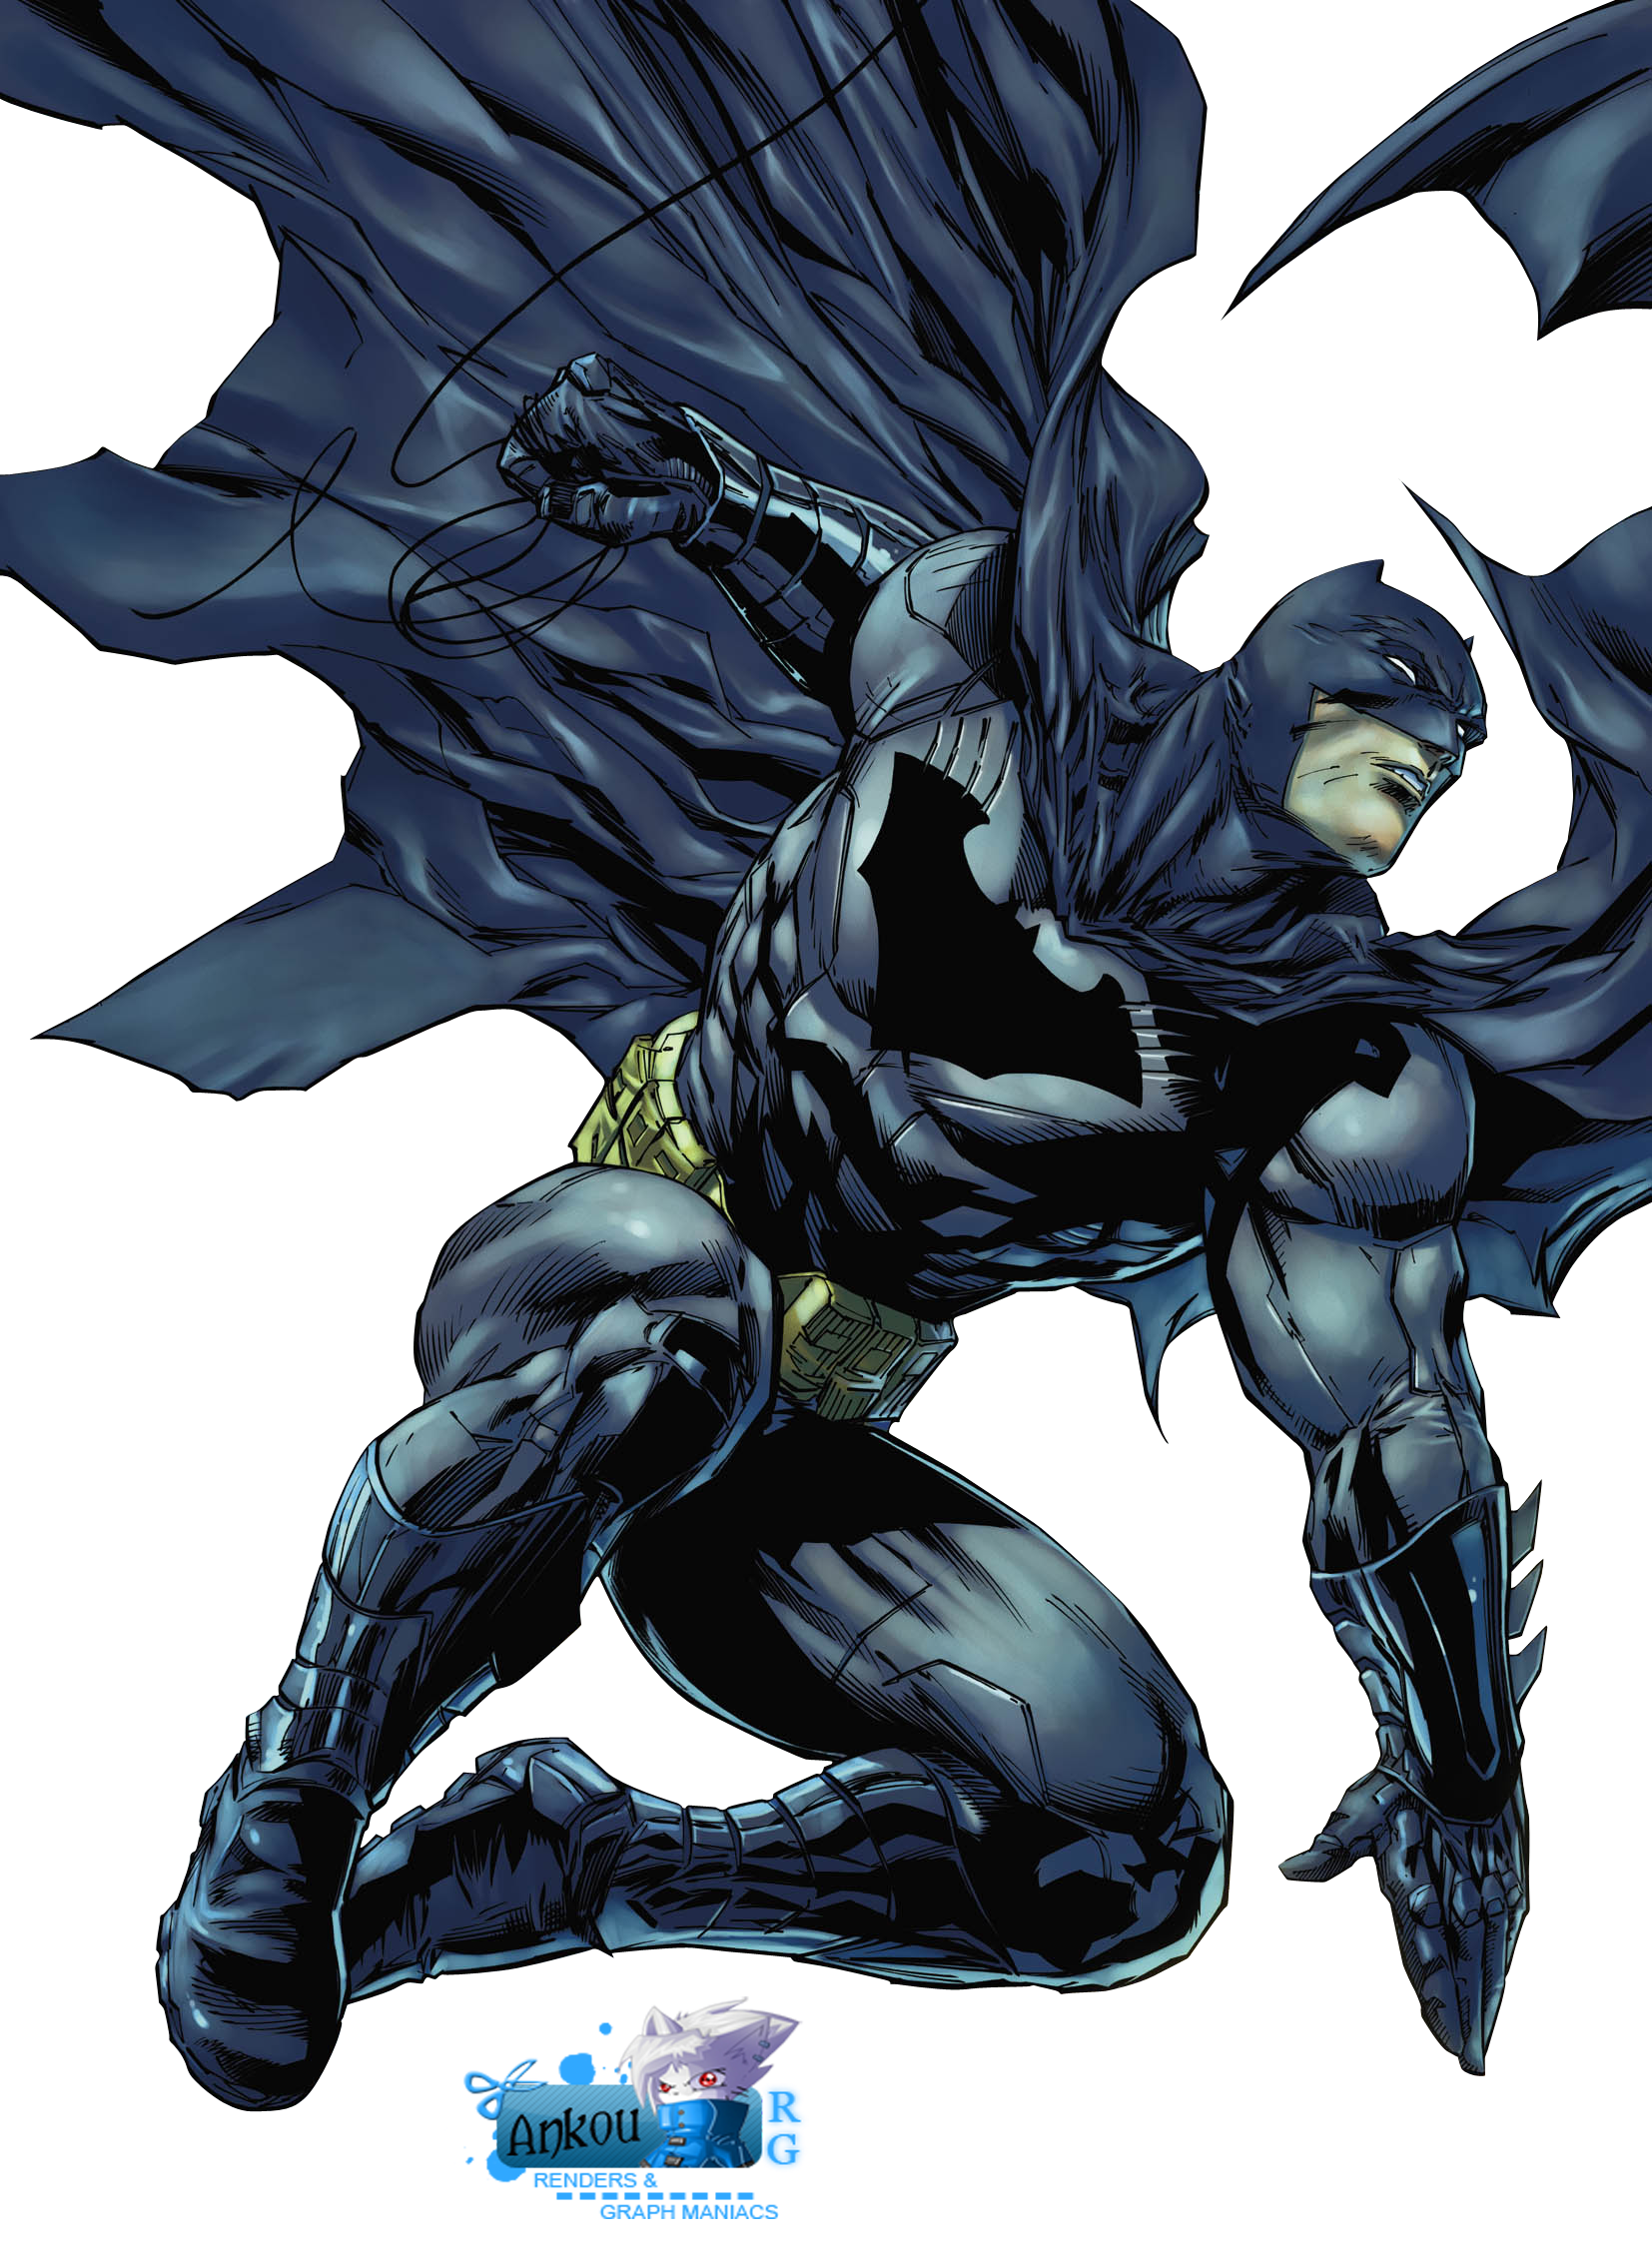 Render Batman Dc Comics Dc Comics Comics Png Image Sans Fond Poste Par Ankou Telecharger Le Render Godzilla Bosquejos De Animales Dc Comics